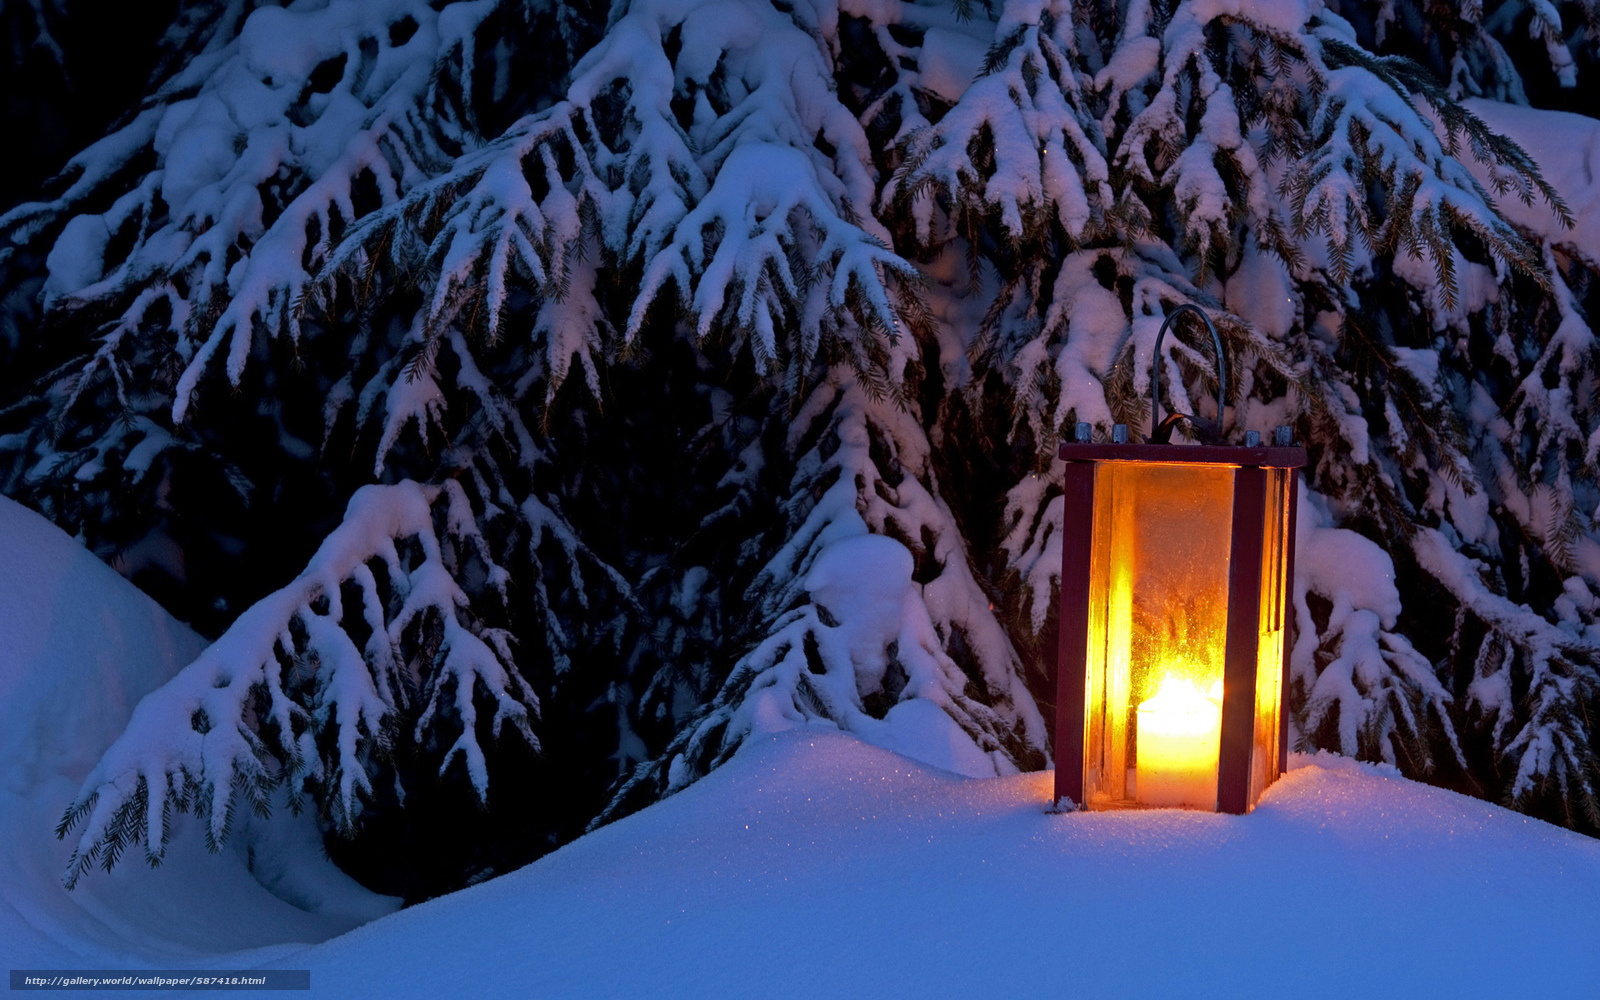 Winter005634vipics winter005634vipicsjpg